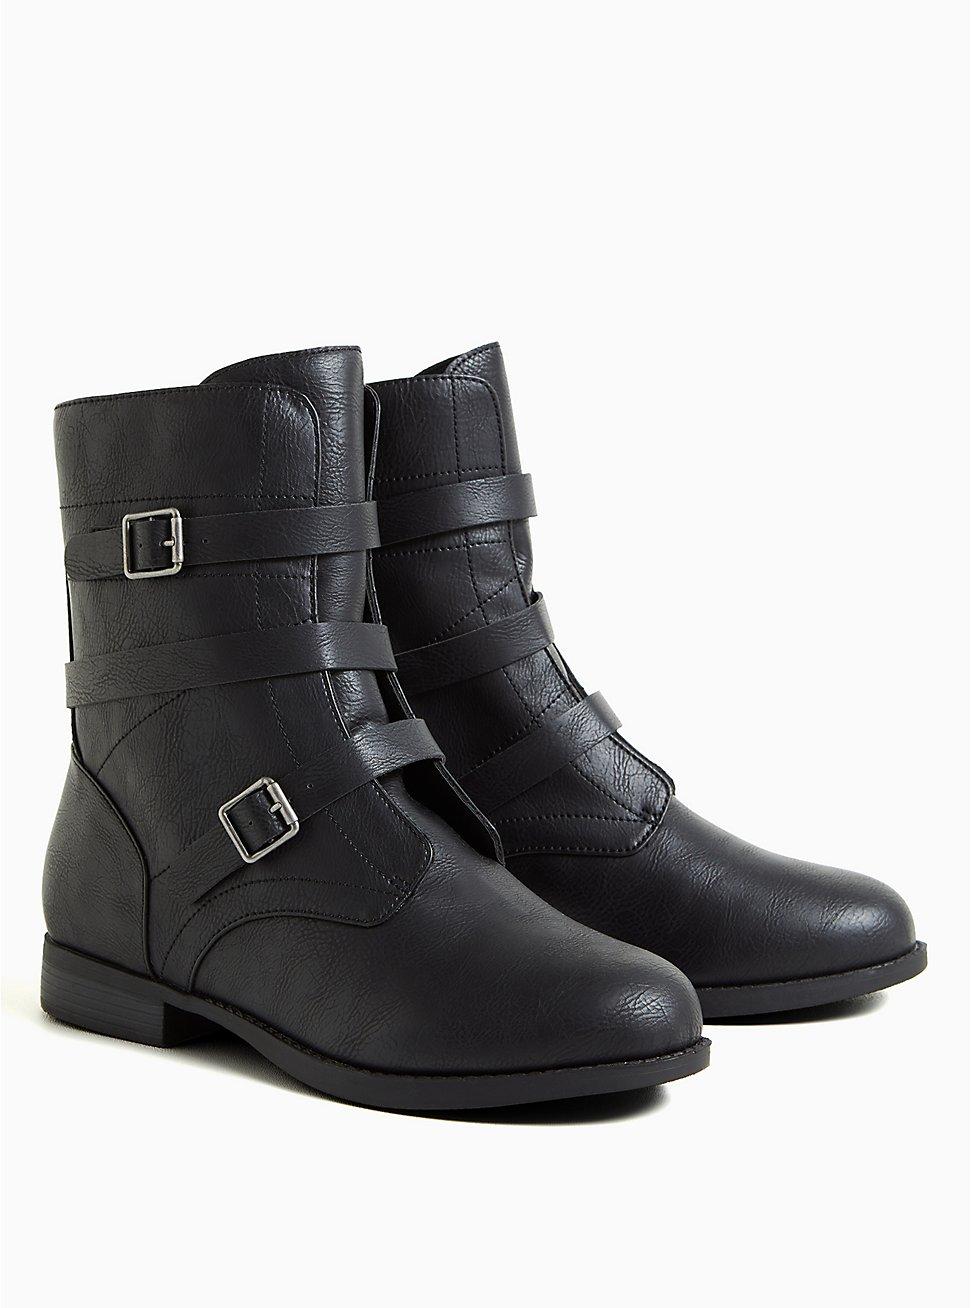 Plus Size Black Faux Leather Strappy Combat Boot (WW), BLACK, hi-res